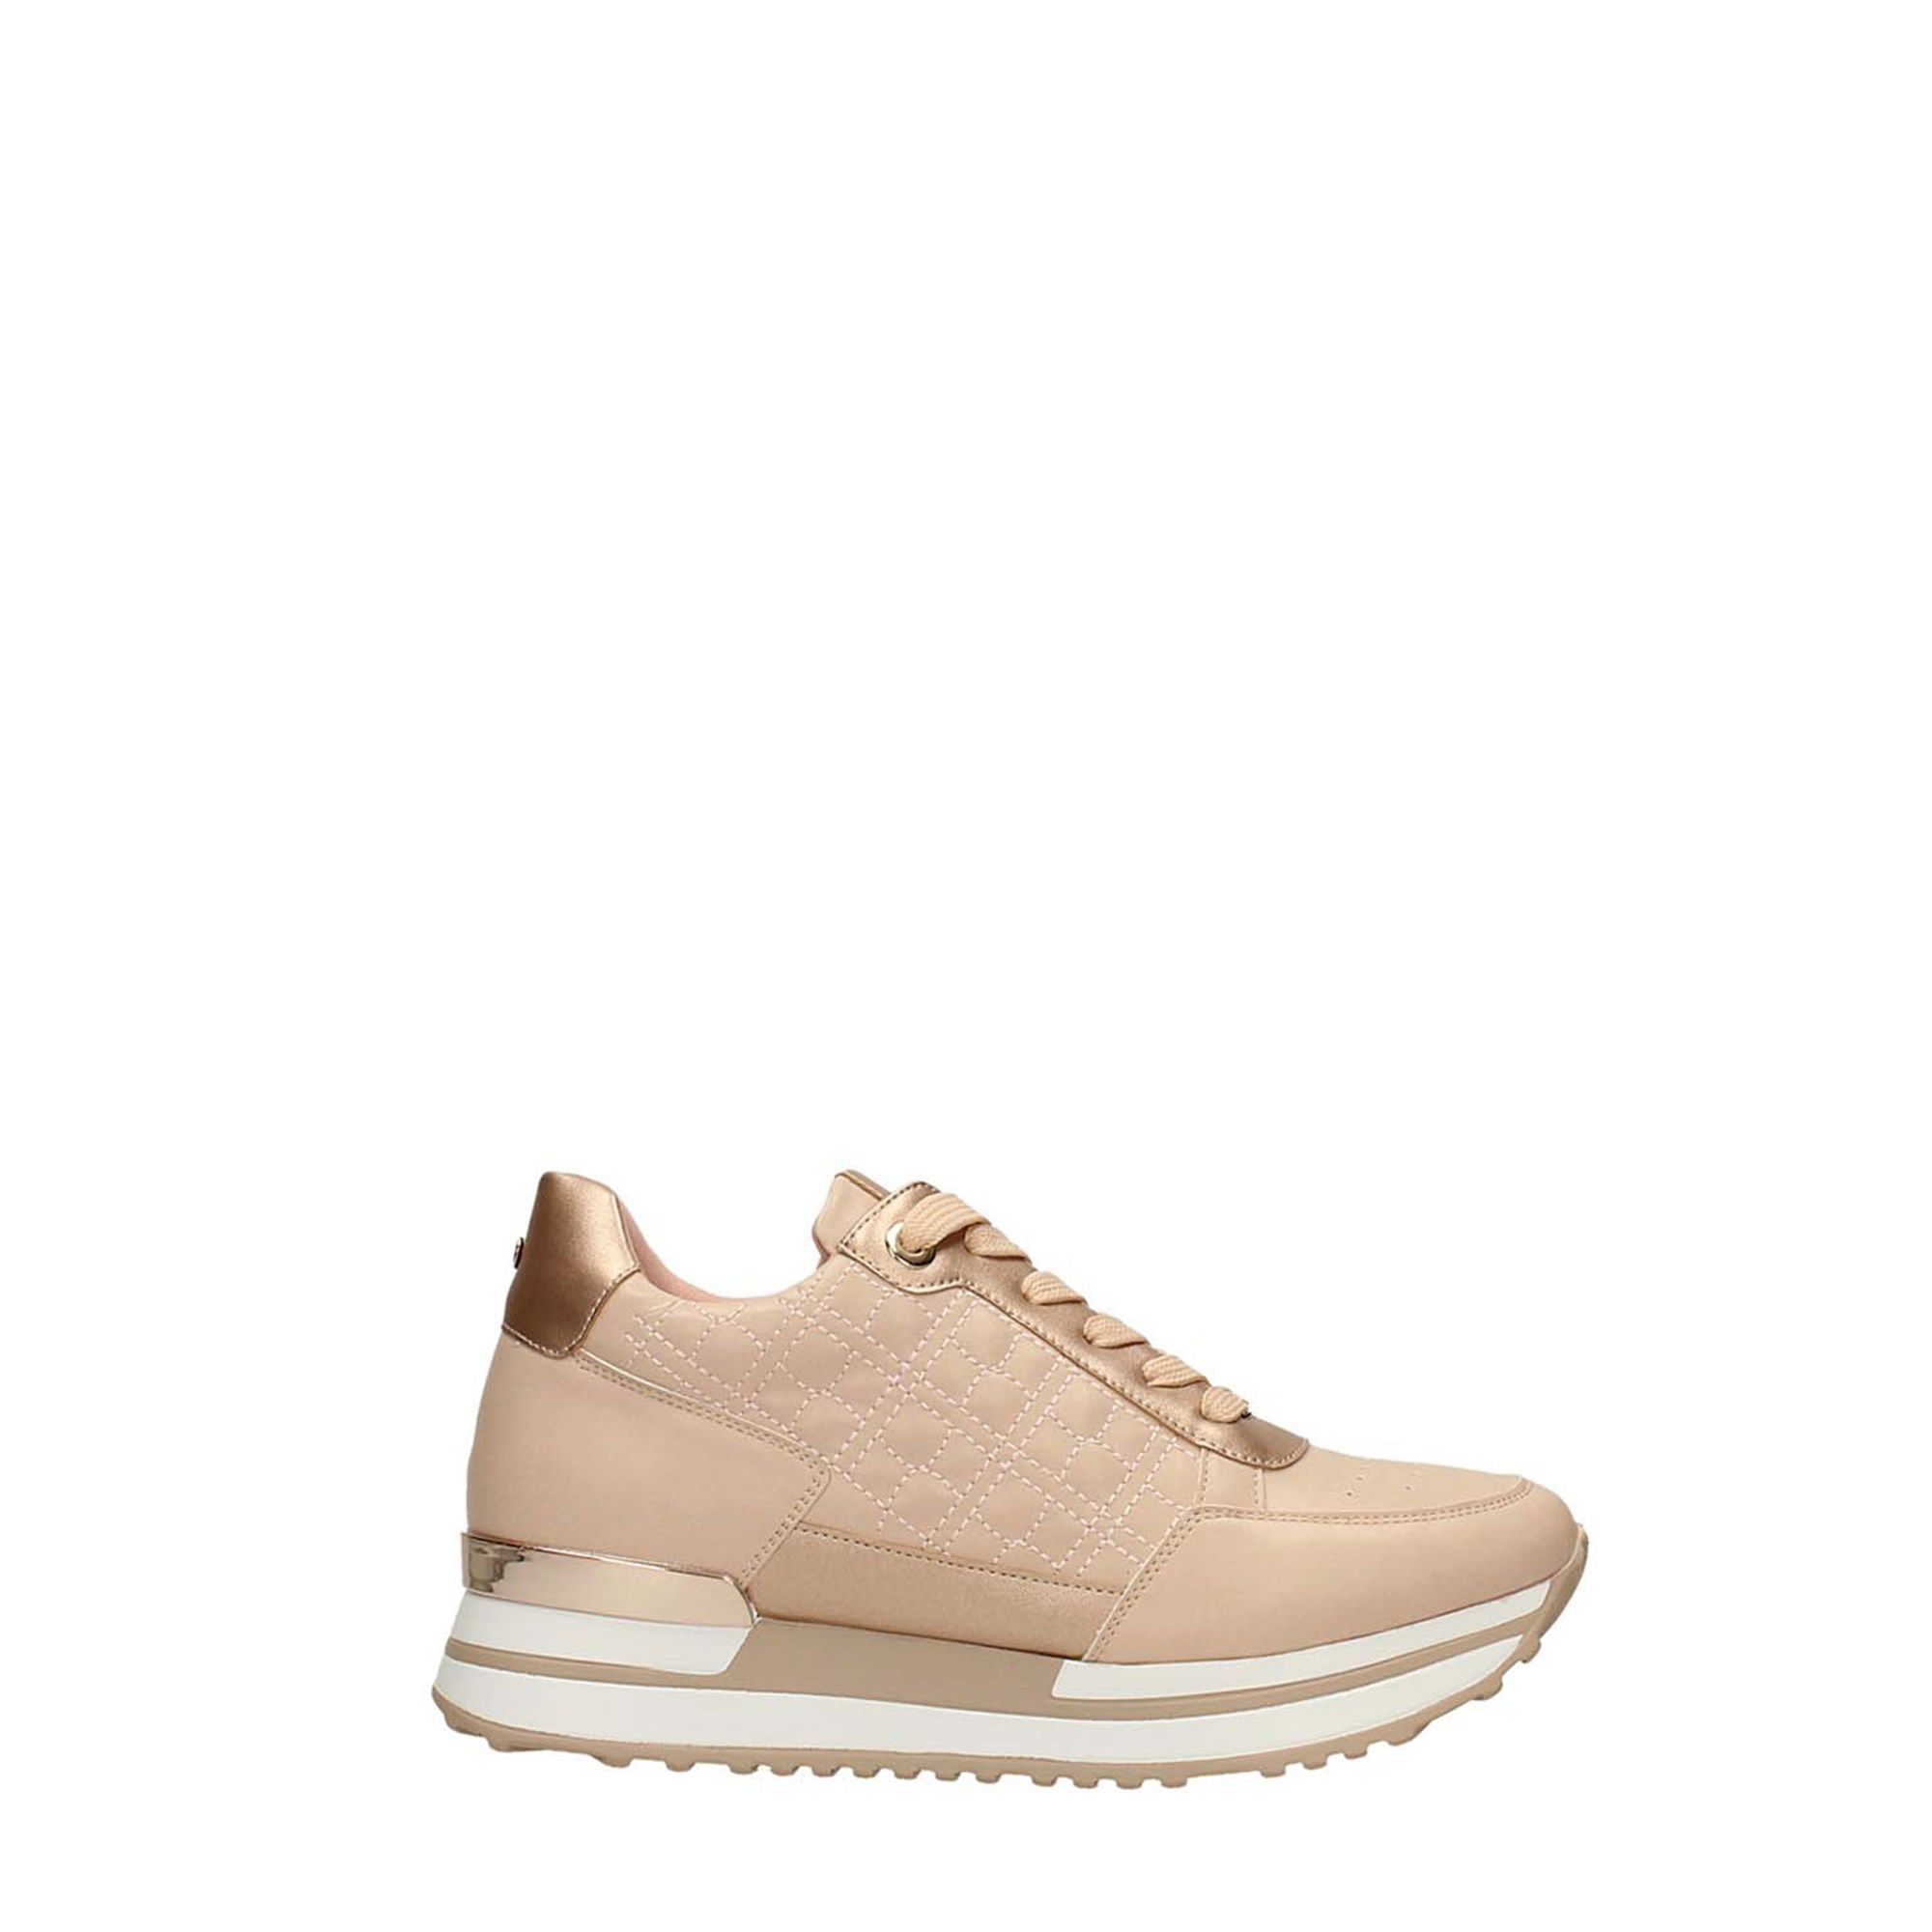 Sneakers Tata Italia Woman - - Buy